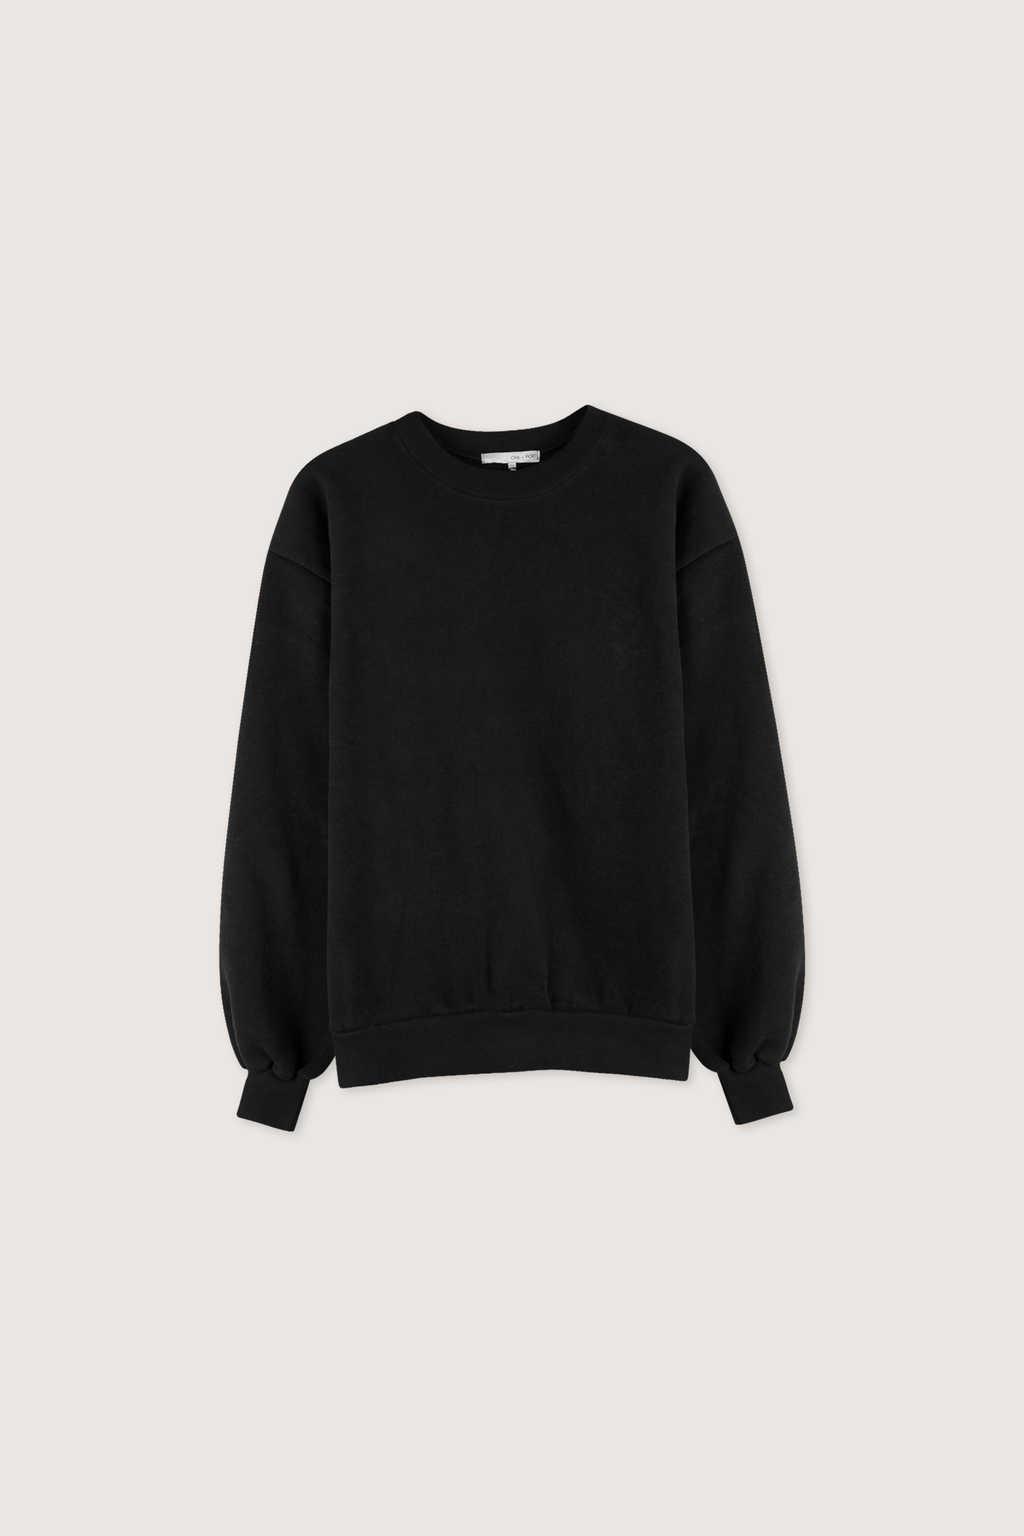 Sweatshirt H479 Black 9